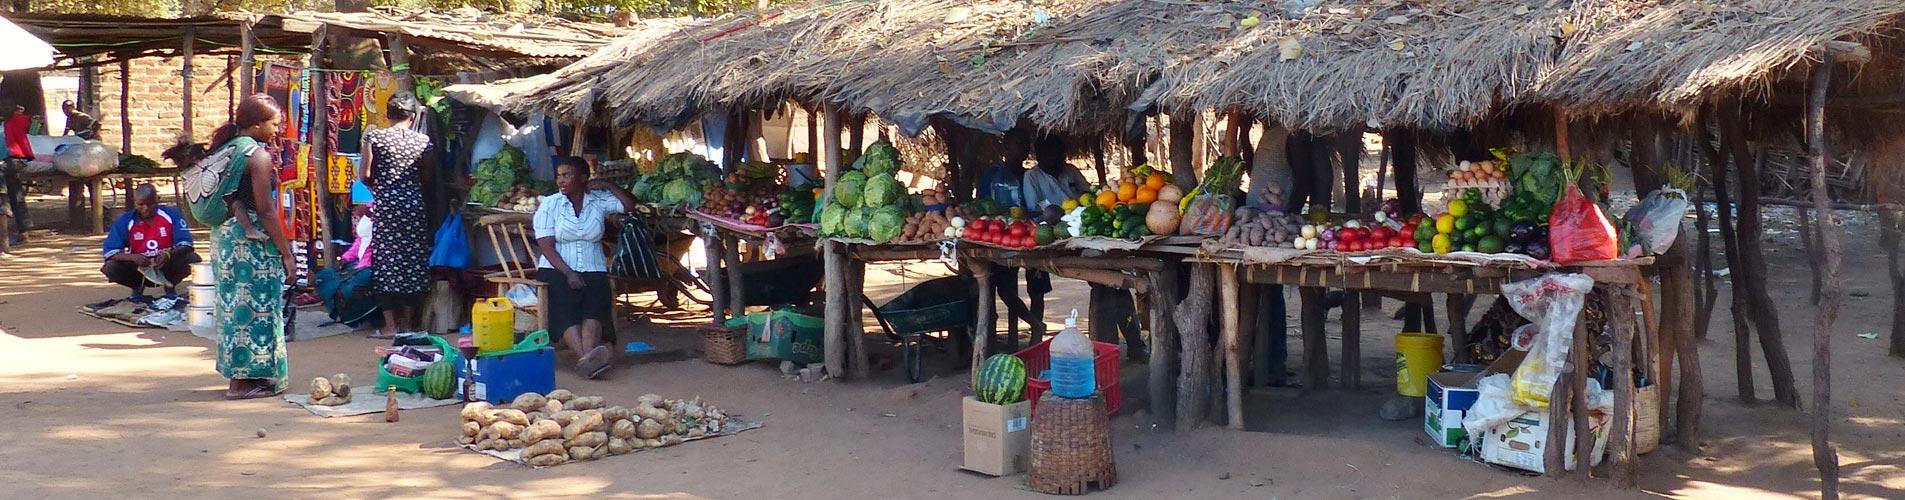 Mfuwe Village